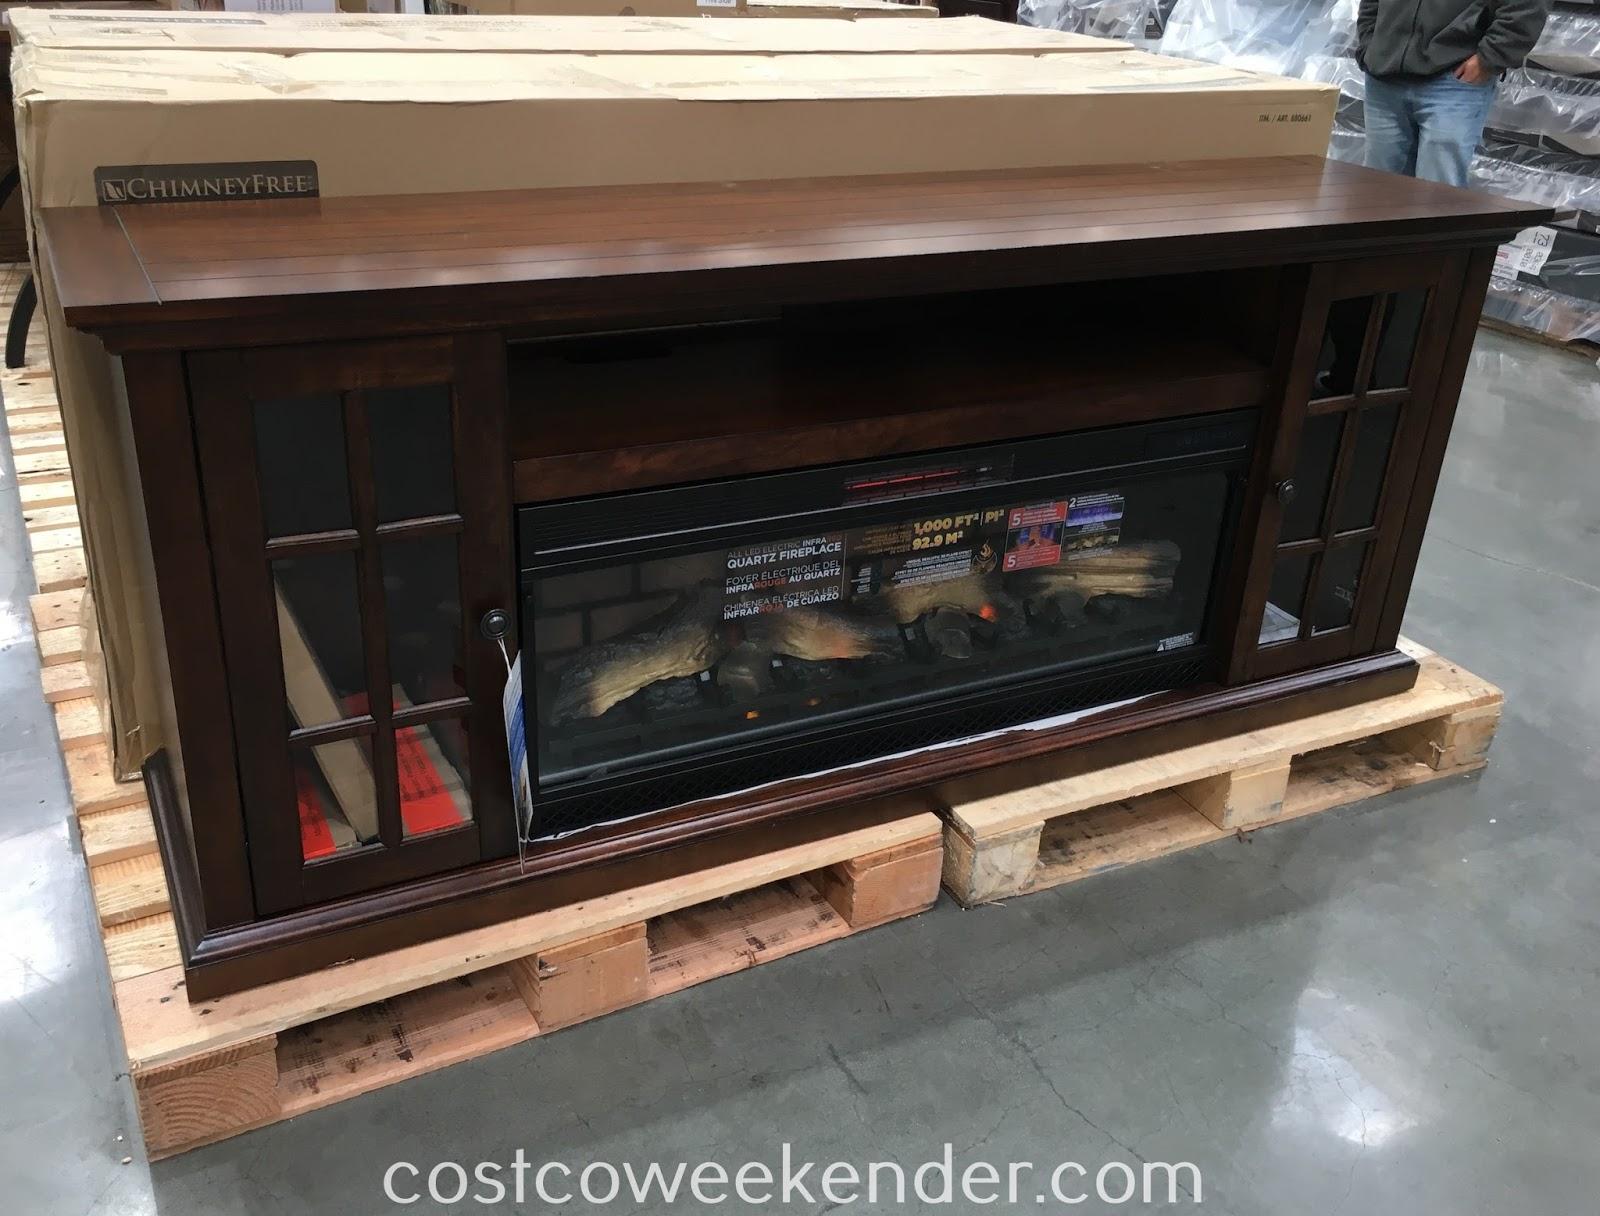 Tresanti Chimneyfree Infrared Fireplace And Media Mantel